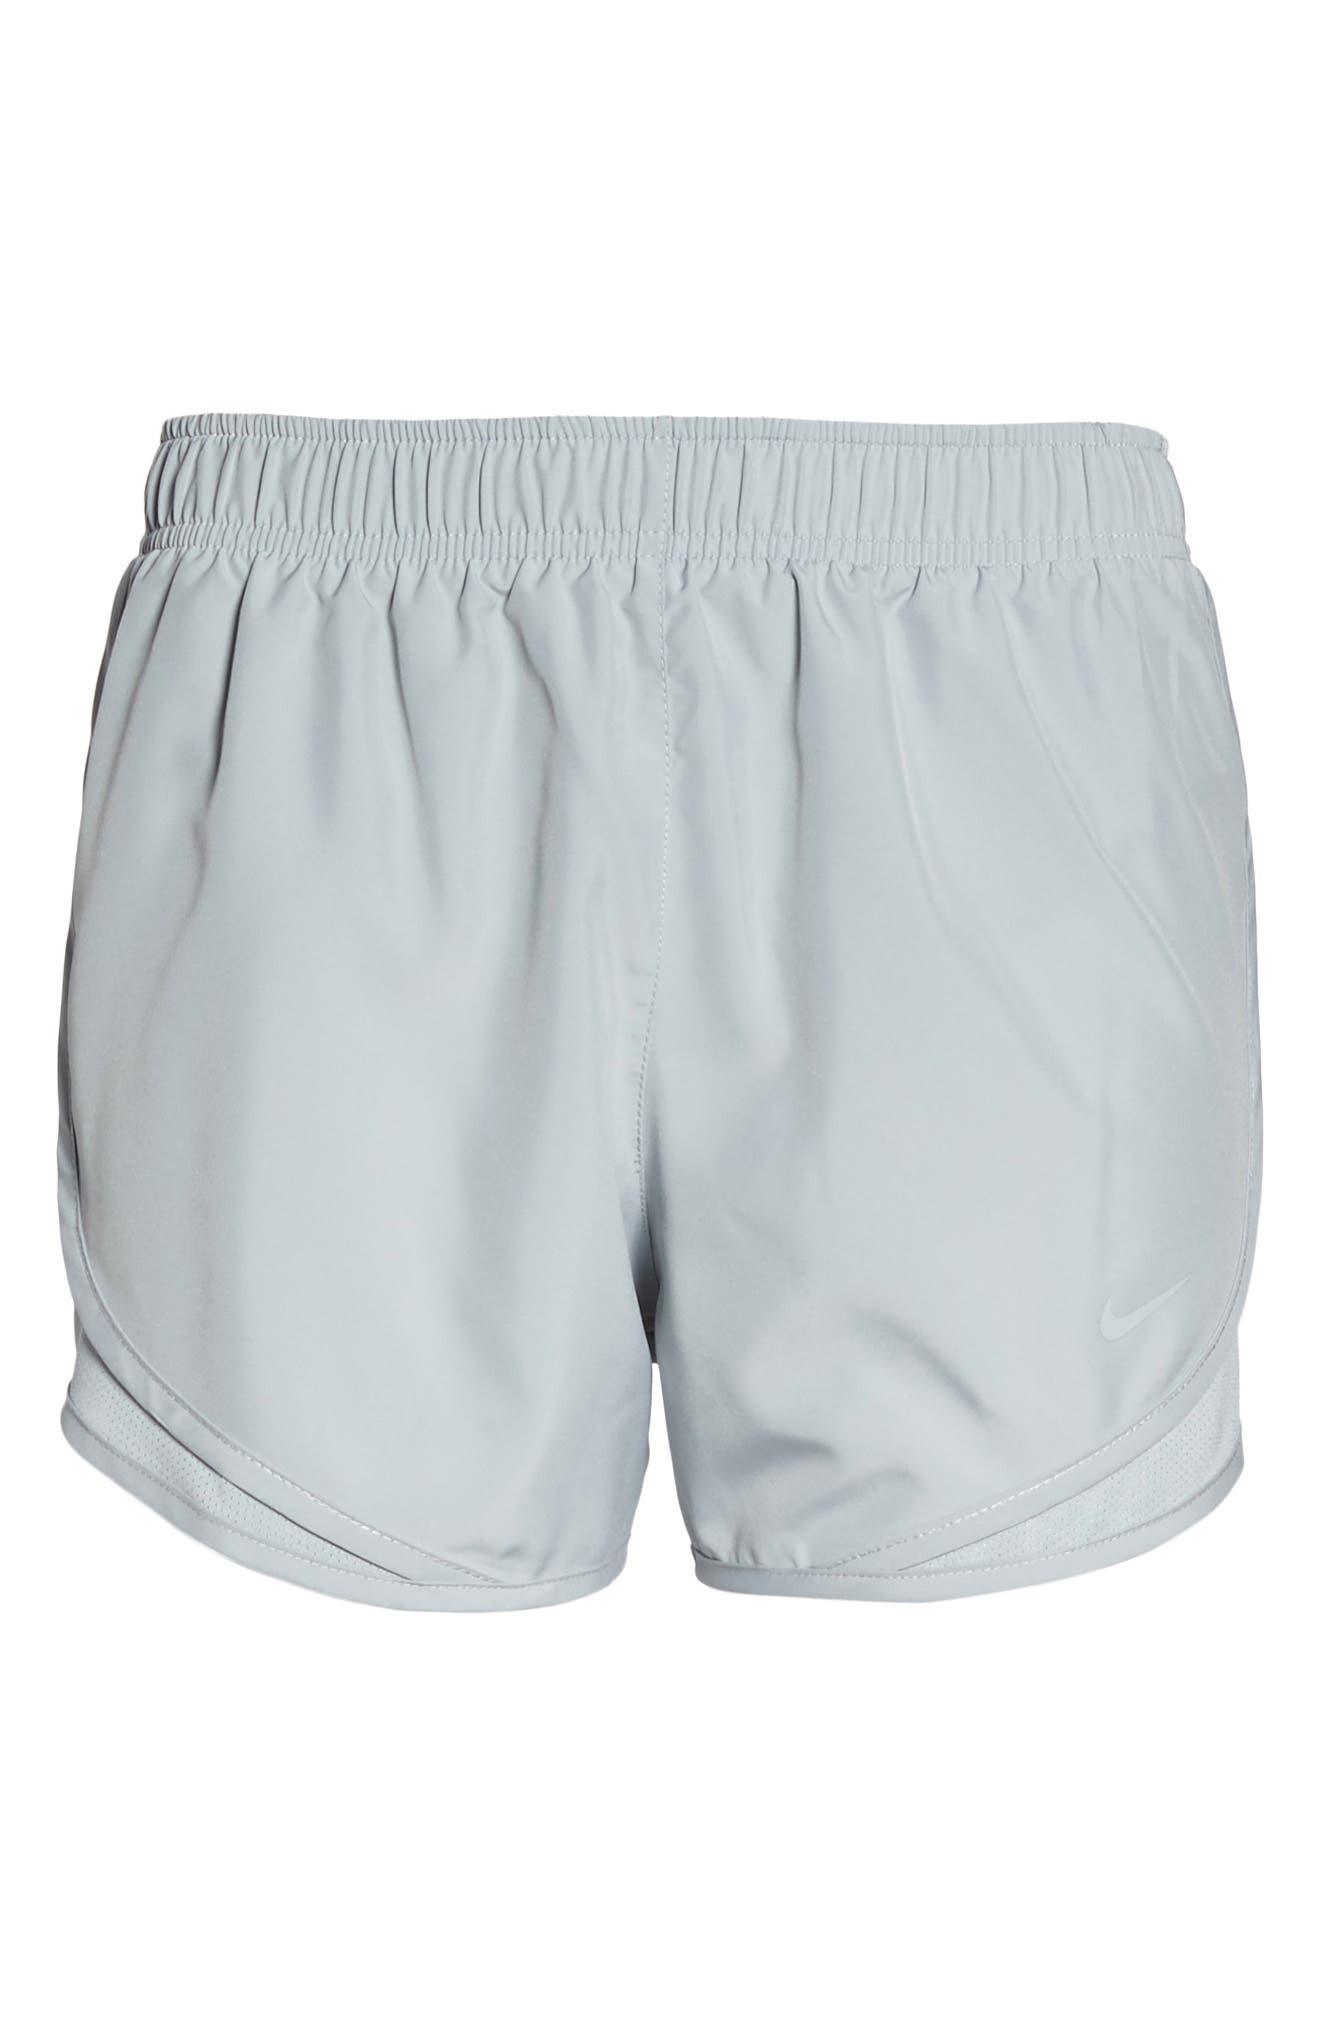 Dry Tempo Running Shorts,                             Alternate thumbnail 441, color,